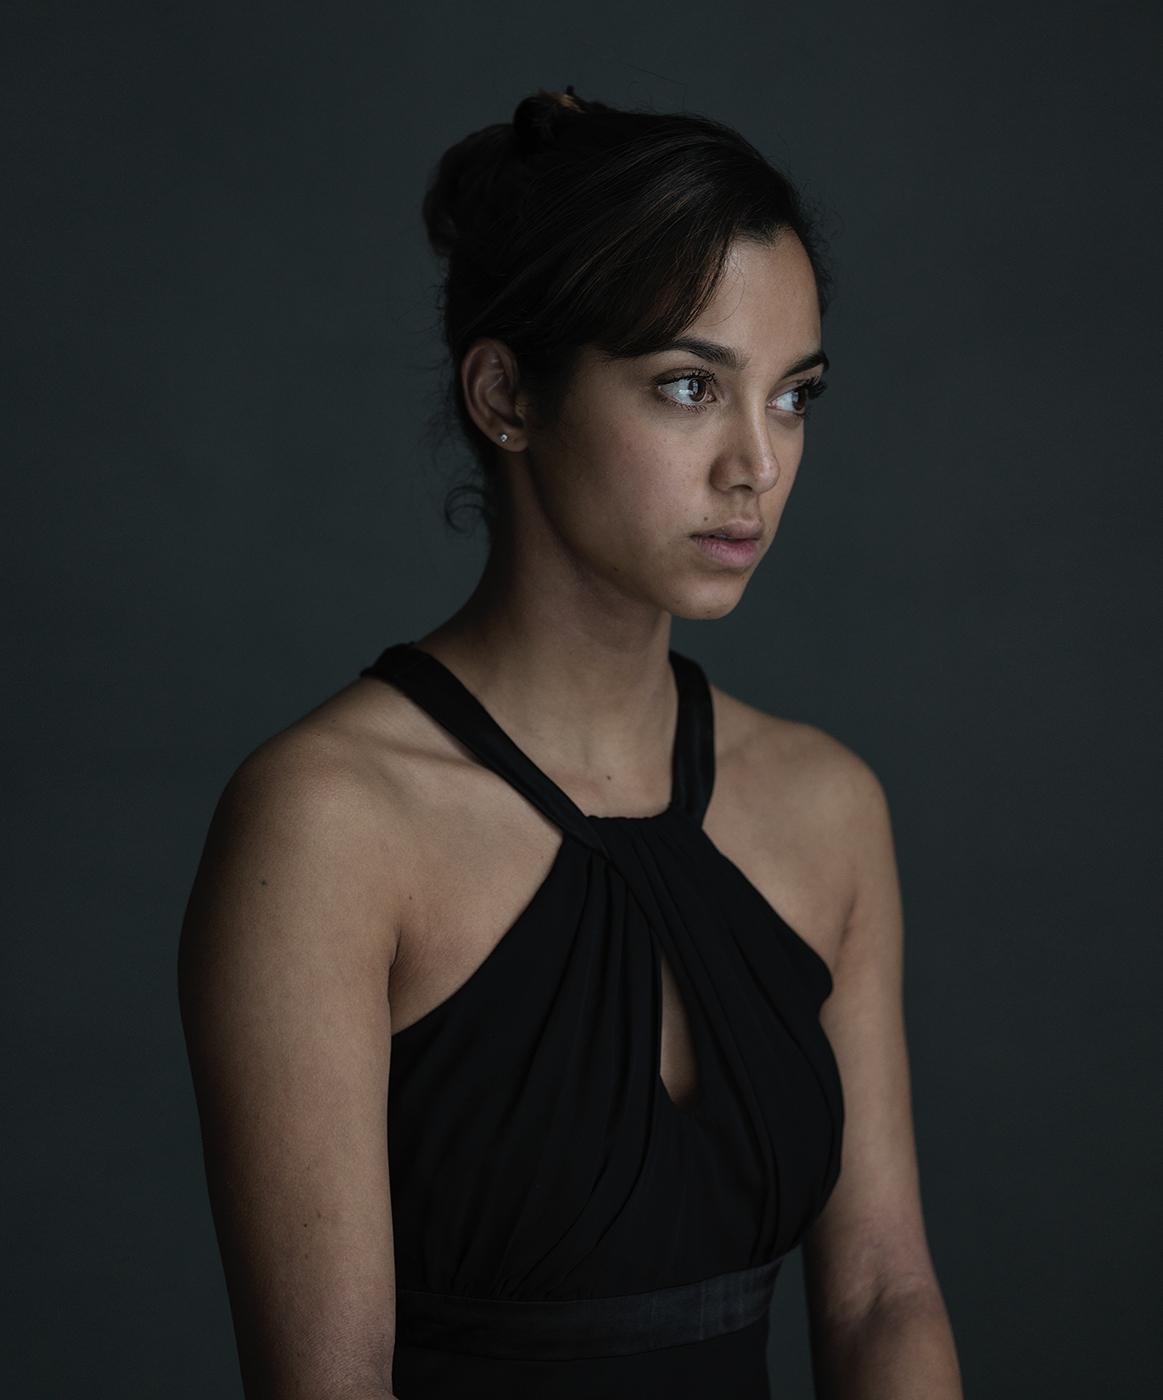 Elise, Susanne Middelberg, actress, acting, film, portret, portrait